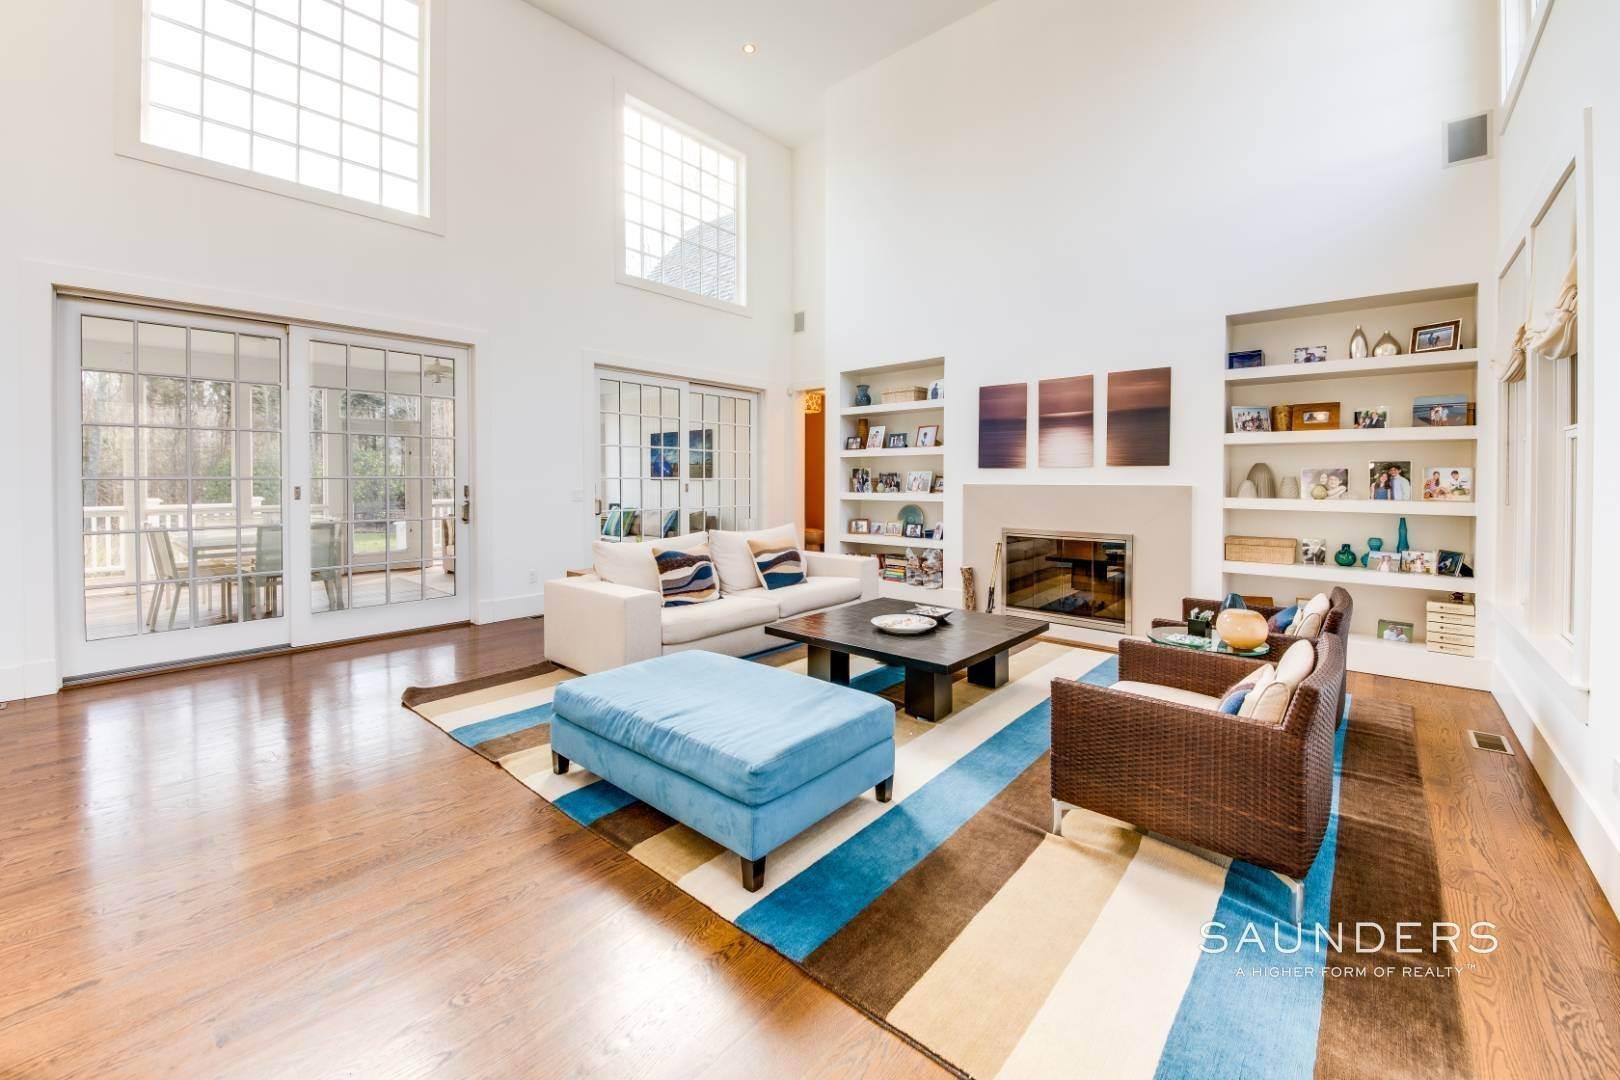 4. Single Family Homes for Sale at Wainscott South Traditional Near Beach Lane 10 Merriwood Drive, Wainscott, East Hampton Town, NY 11975